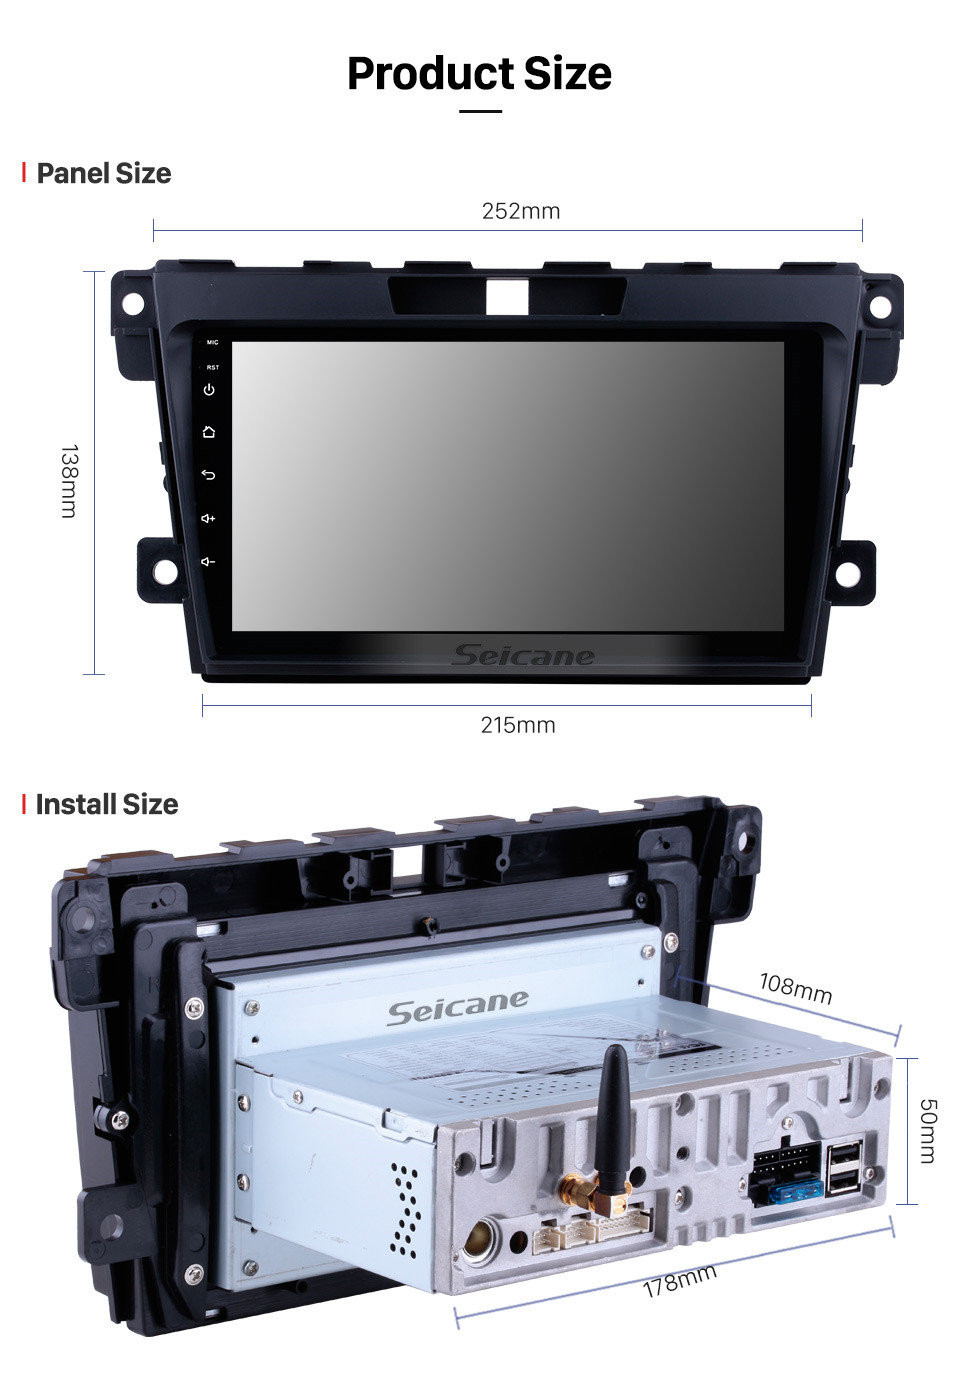 Seicane 9 Zoll Android 10.0 GPS Navigationsradiosystem für 2007 2008 2009 2010 2011 2012 2013 2014 Mazda CX-7 mit Multi-Touchscreen Spiegel Link OBD DVR Bluetooth Rückfahrkamera TV USB 3G WIFI